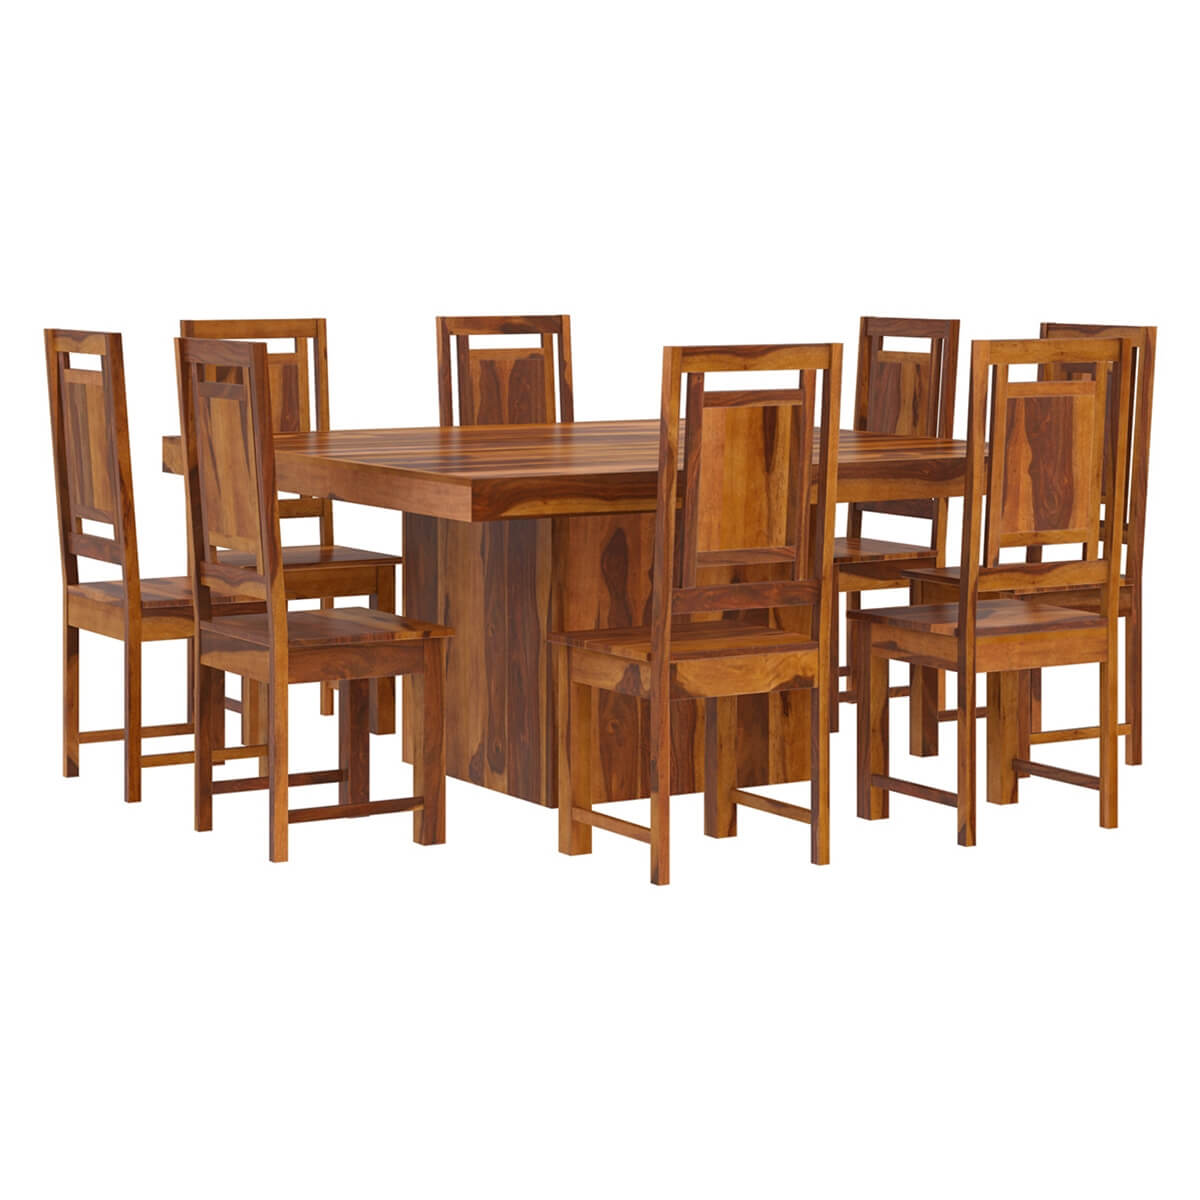 Wood Dining Room Sets: Brocton Solid Wood Square Pedestal 10 Piece Dining Room Set